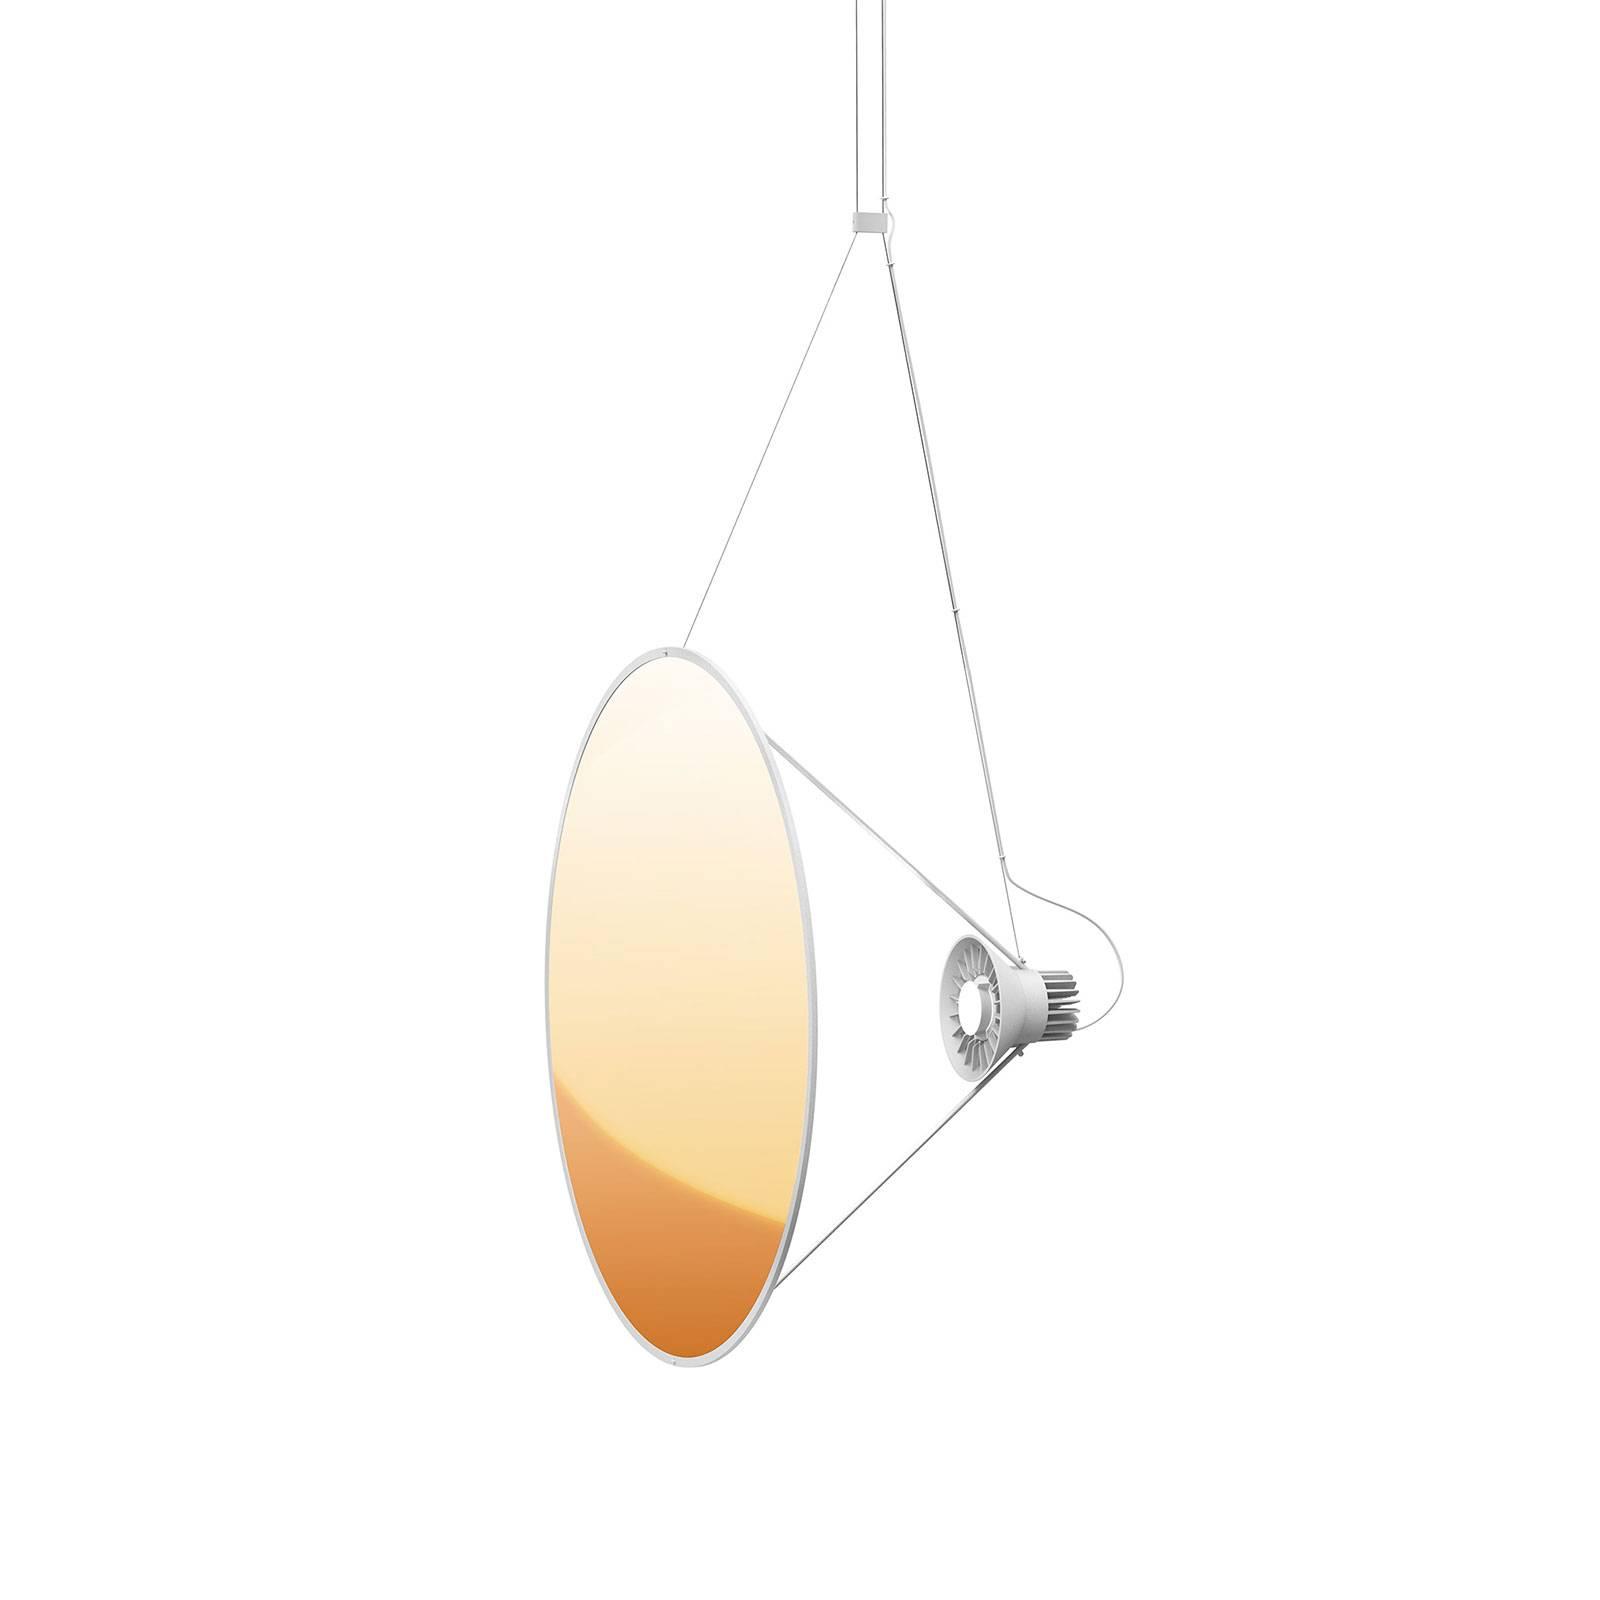 Luceplan Amisol -LED-riippuvalaisin Ø 75 cm kulta